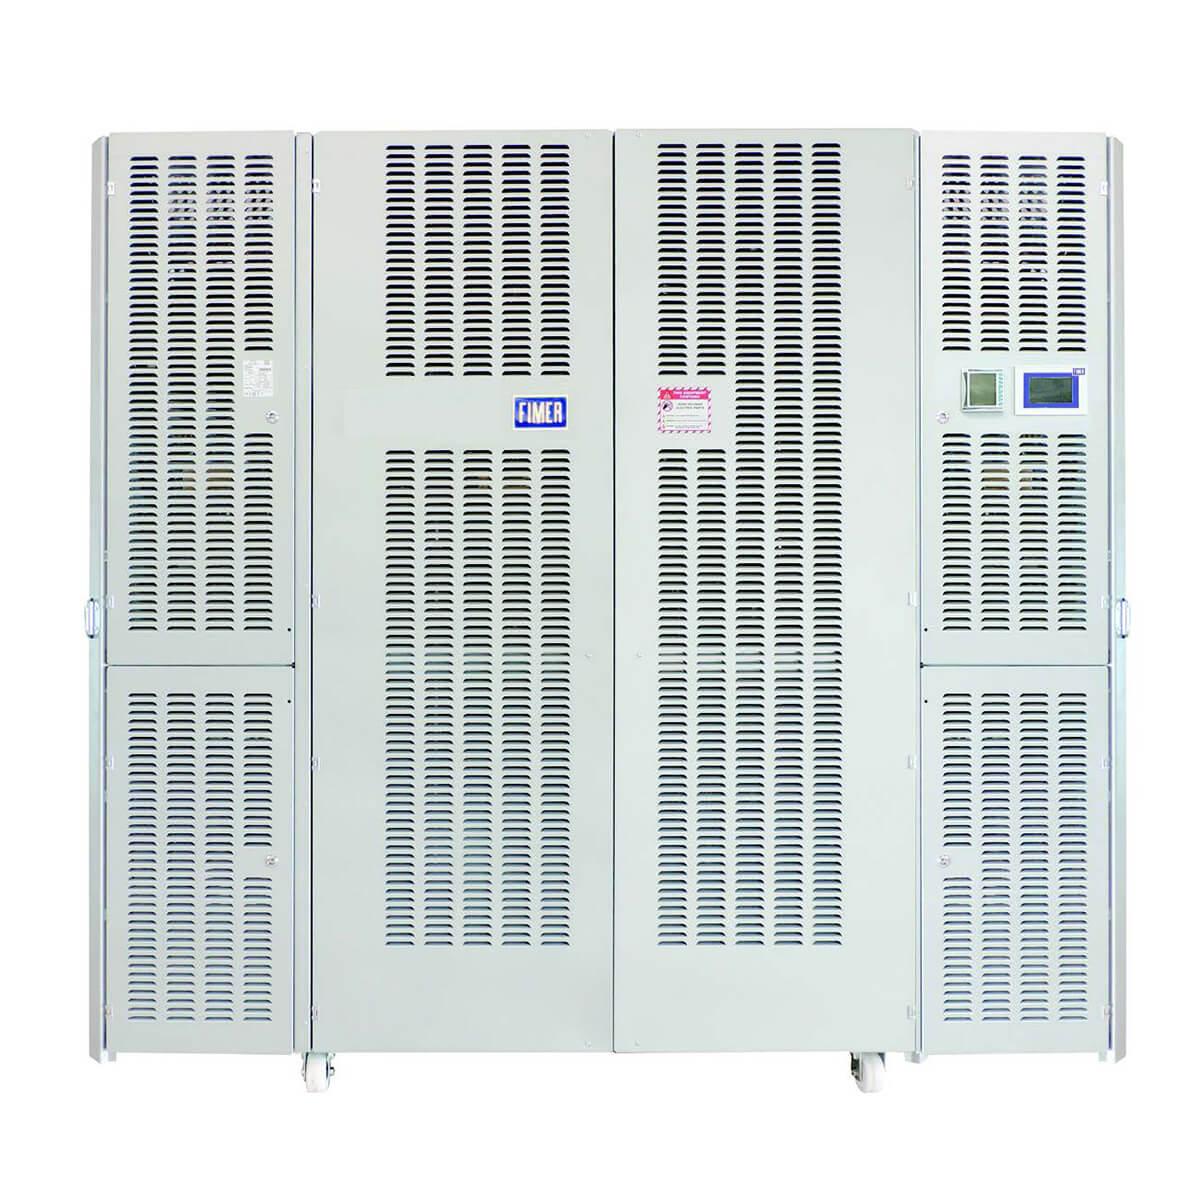 abb fimer 1025kW inverter, abb fimer s11015tl 1025kW inverter, abb fimer s11015tl inverter, abb fimer s11015tl, abb fimer 1025 kW, ABB FIMER 1025 kW